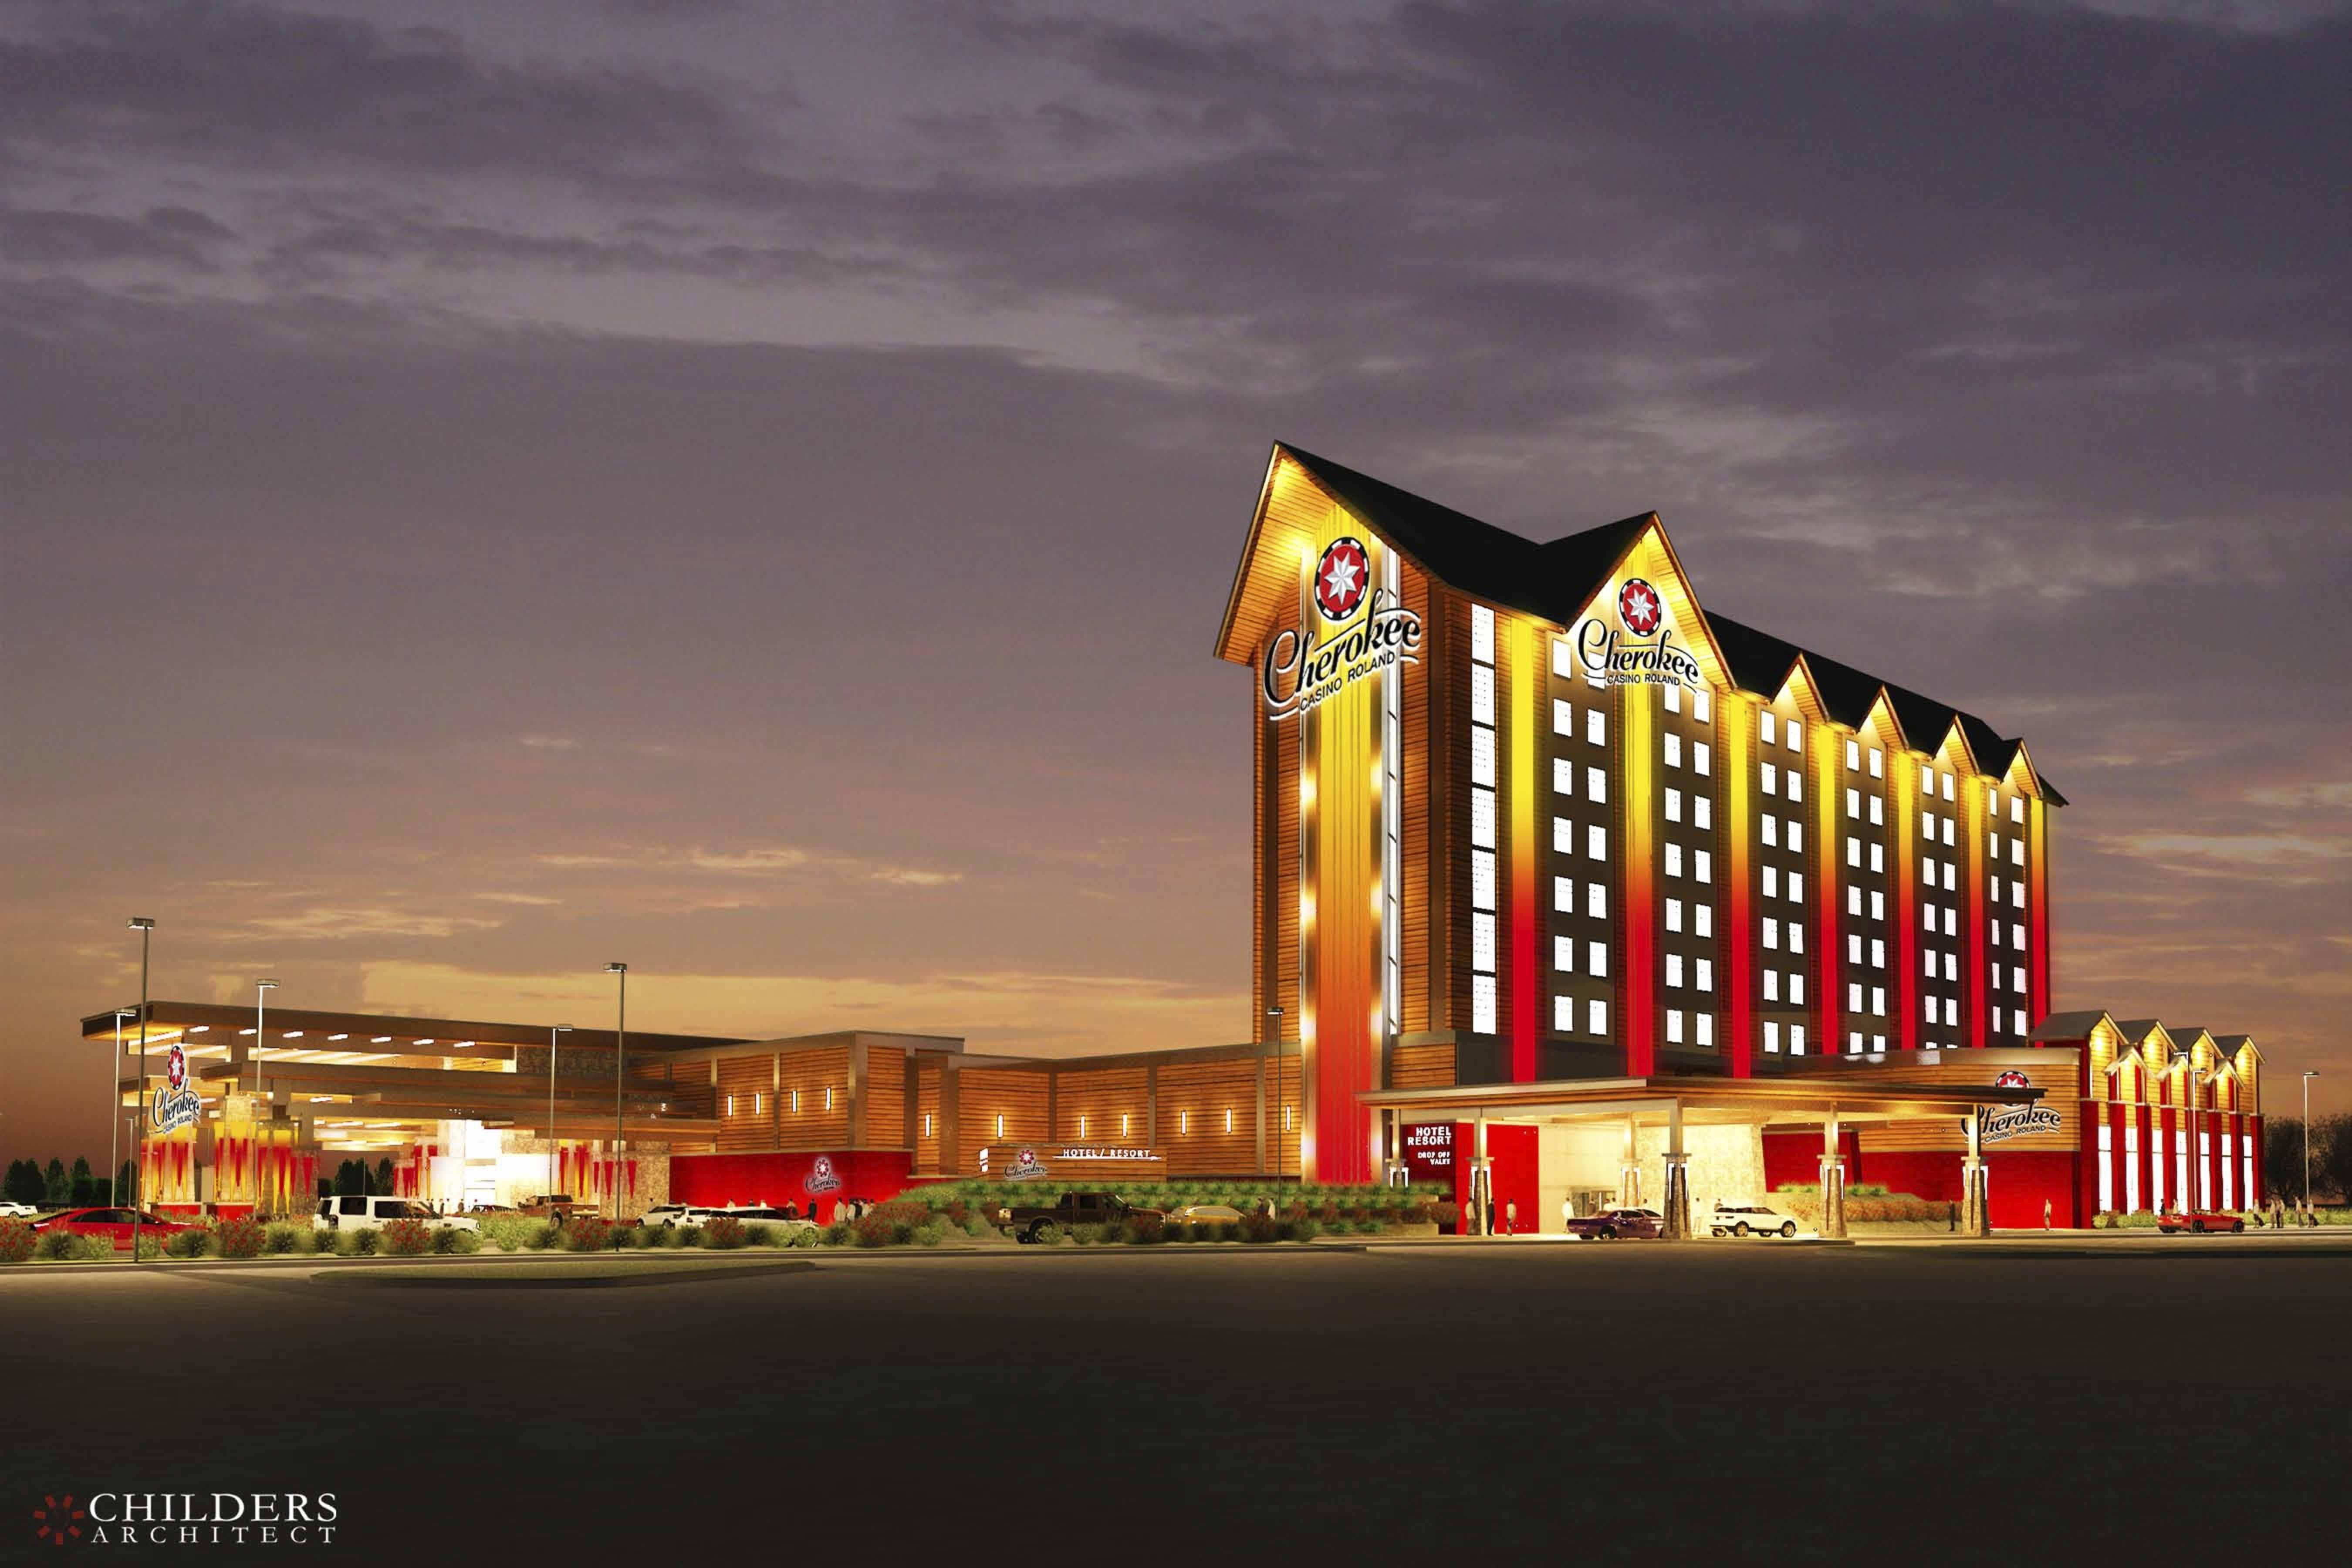 Cherokee nation casino and casino near orange county